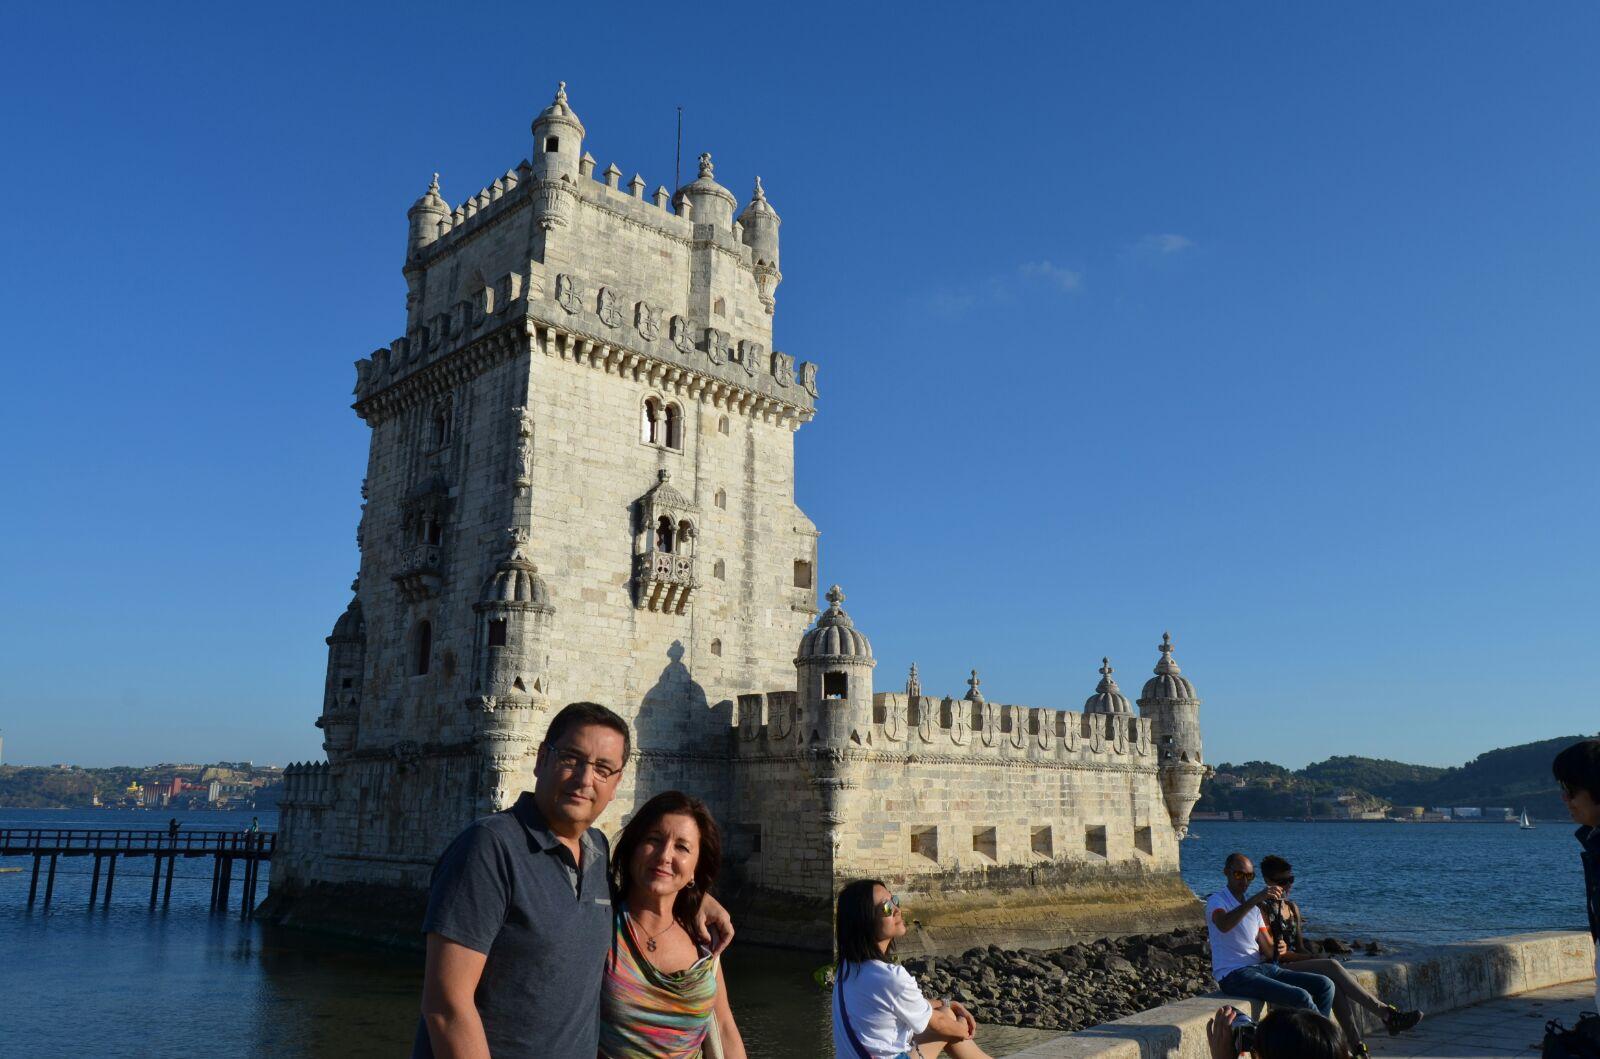 Alfonso y Montse en la torre de Belém en Lisboa.